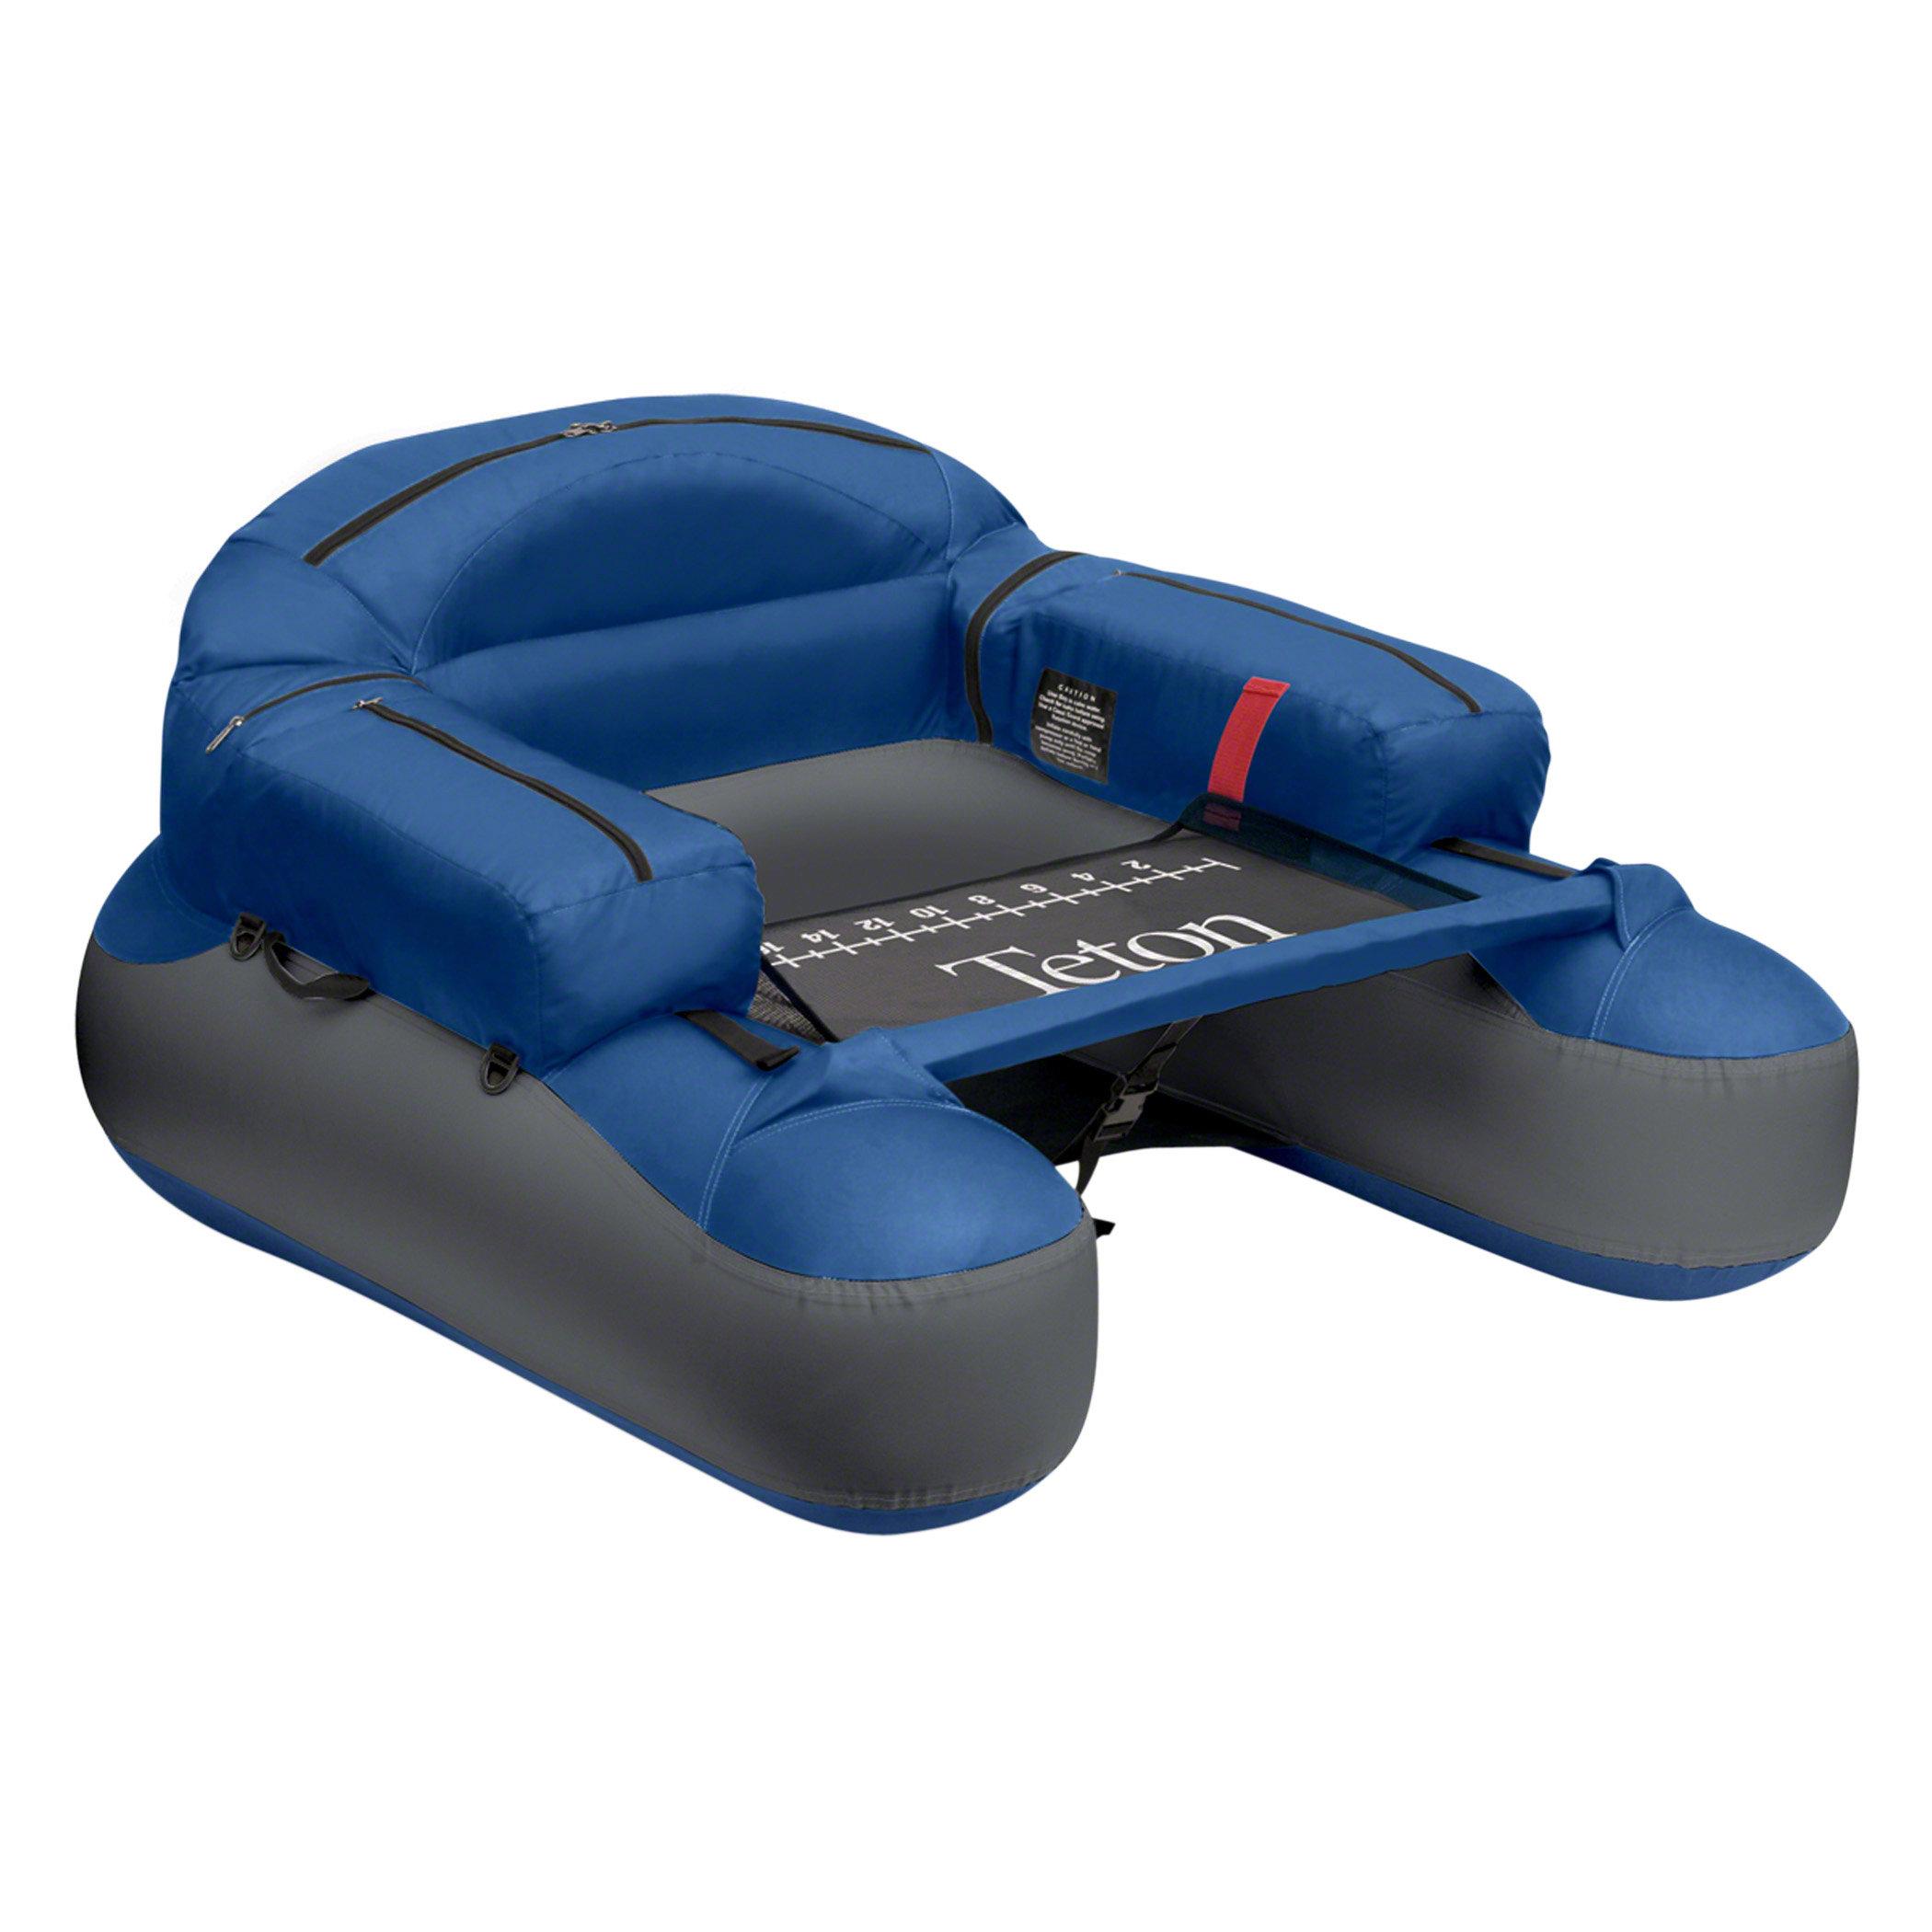 Amazon.com : Classic Accessories Teton Inflatable Fishing